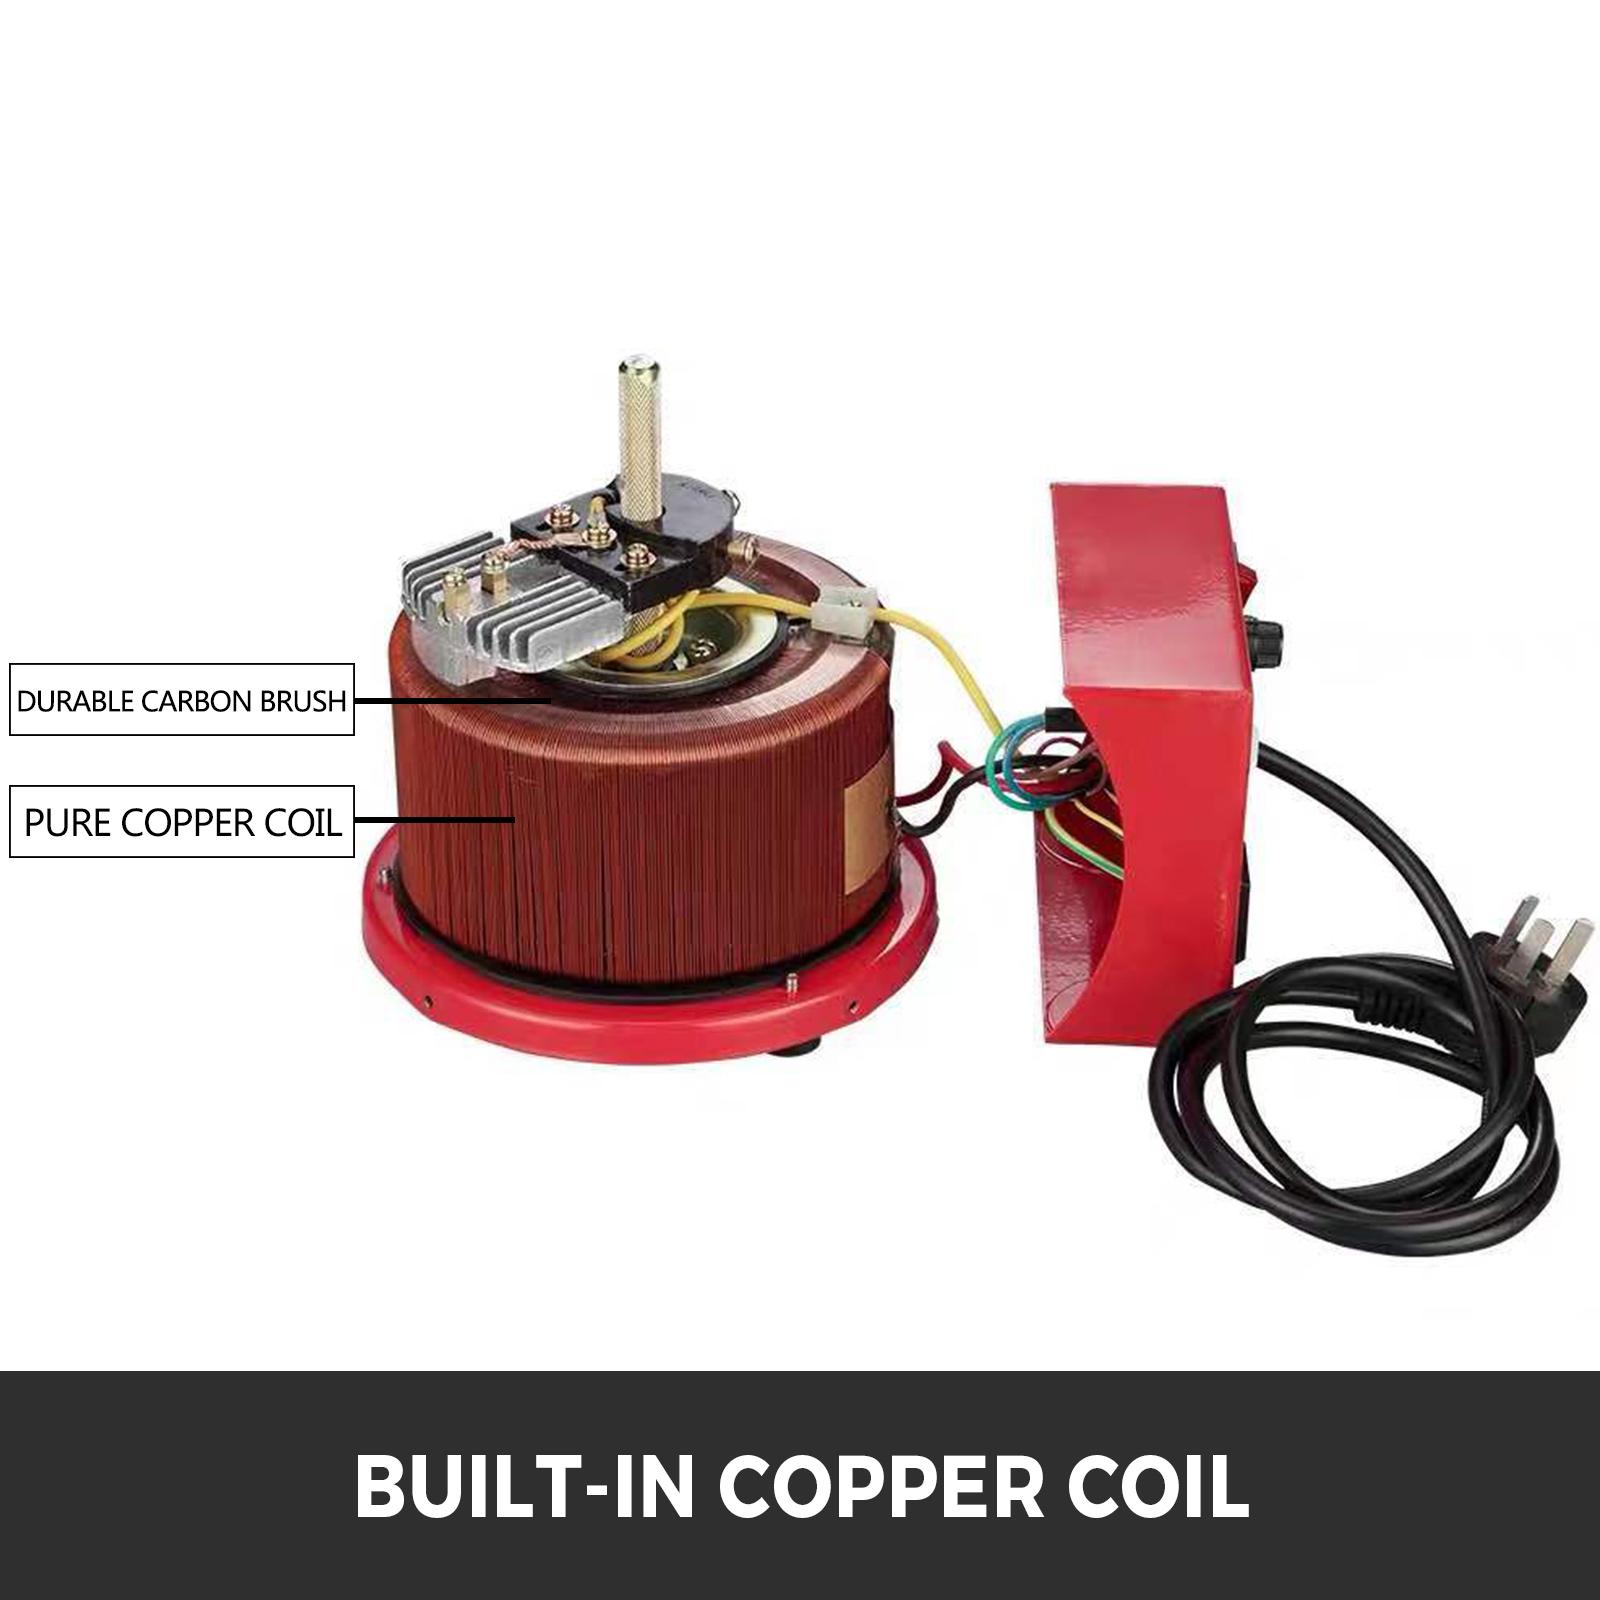 Auto-Variac-Variable-Transformer-0-5-1-2-3KVA-Regulator-pure-copper-coil-220V thumbnail 50